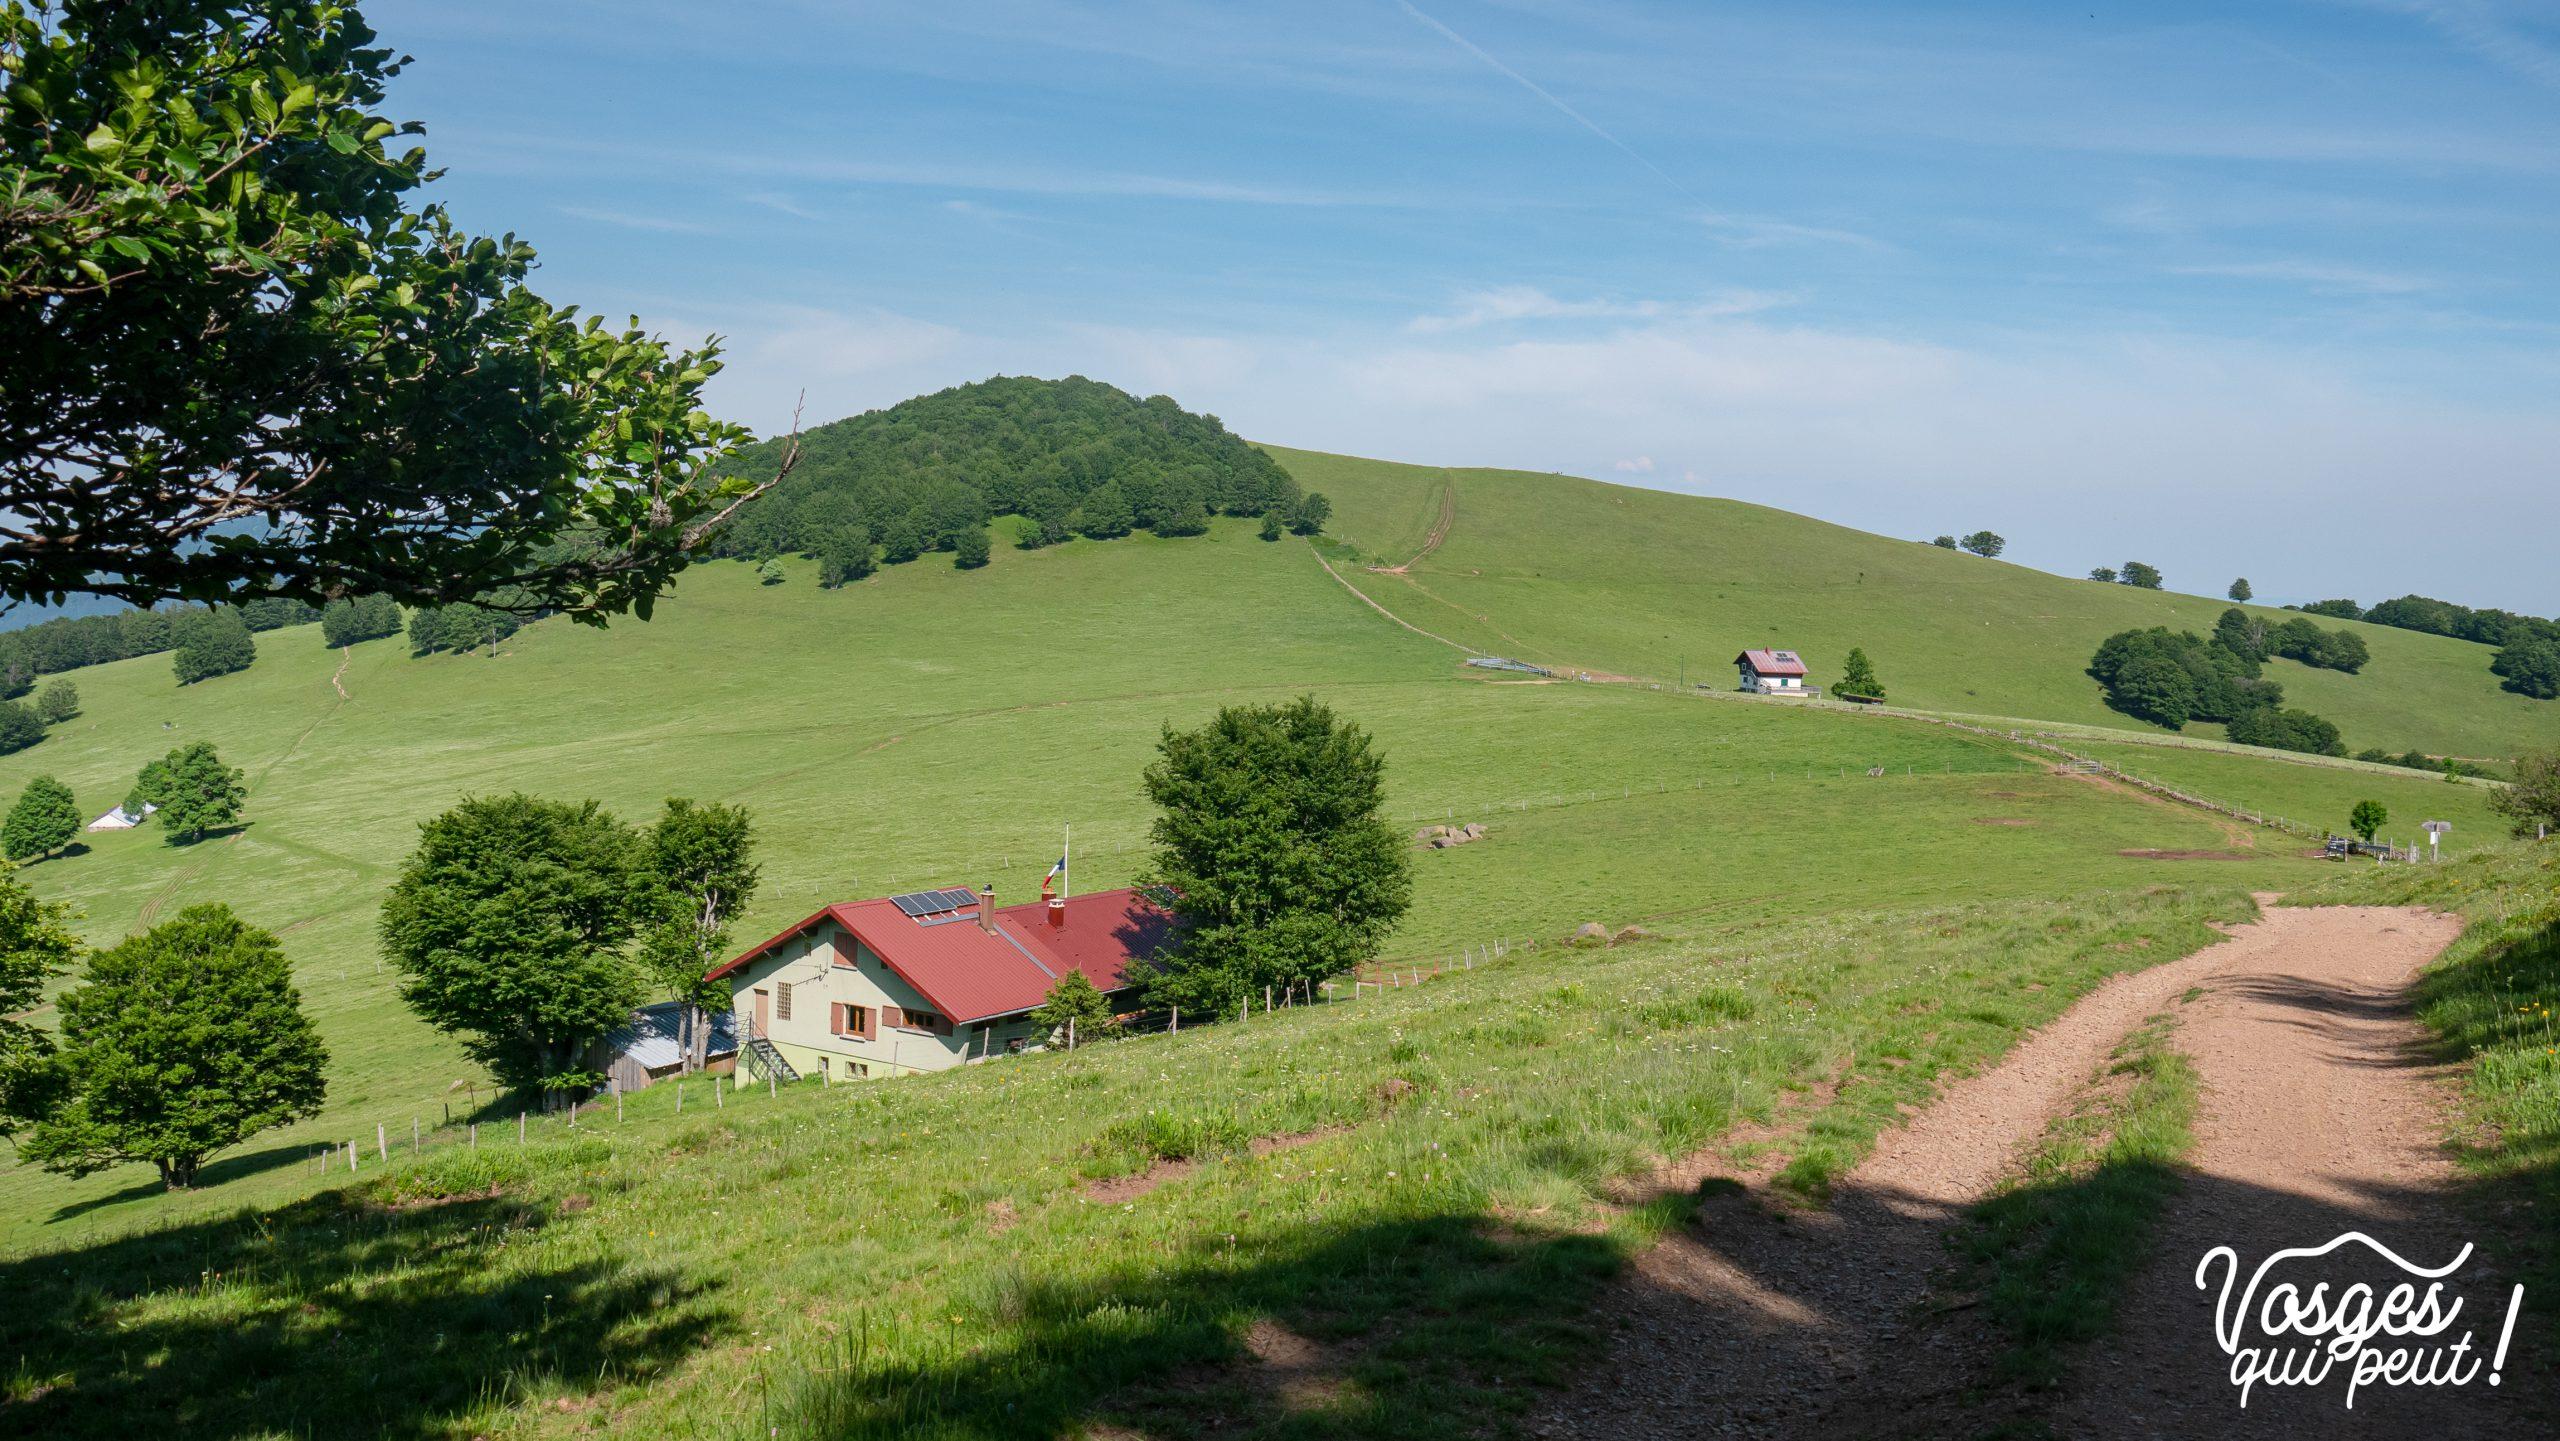 Vue sur le refuge du Rossberg dans le Massif des Vosges